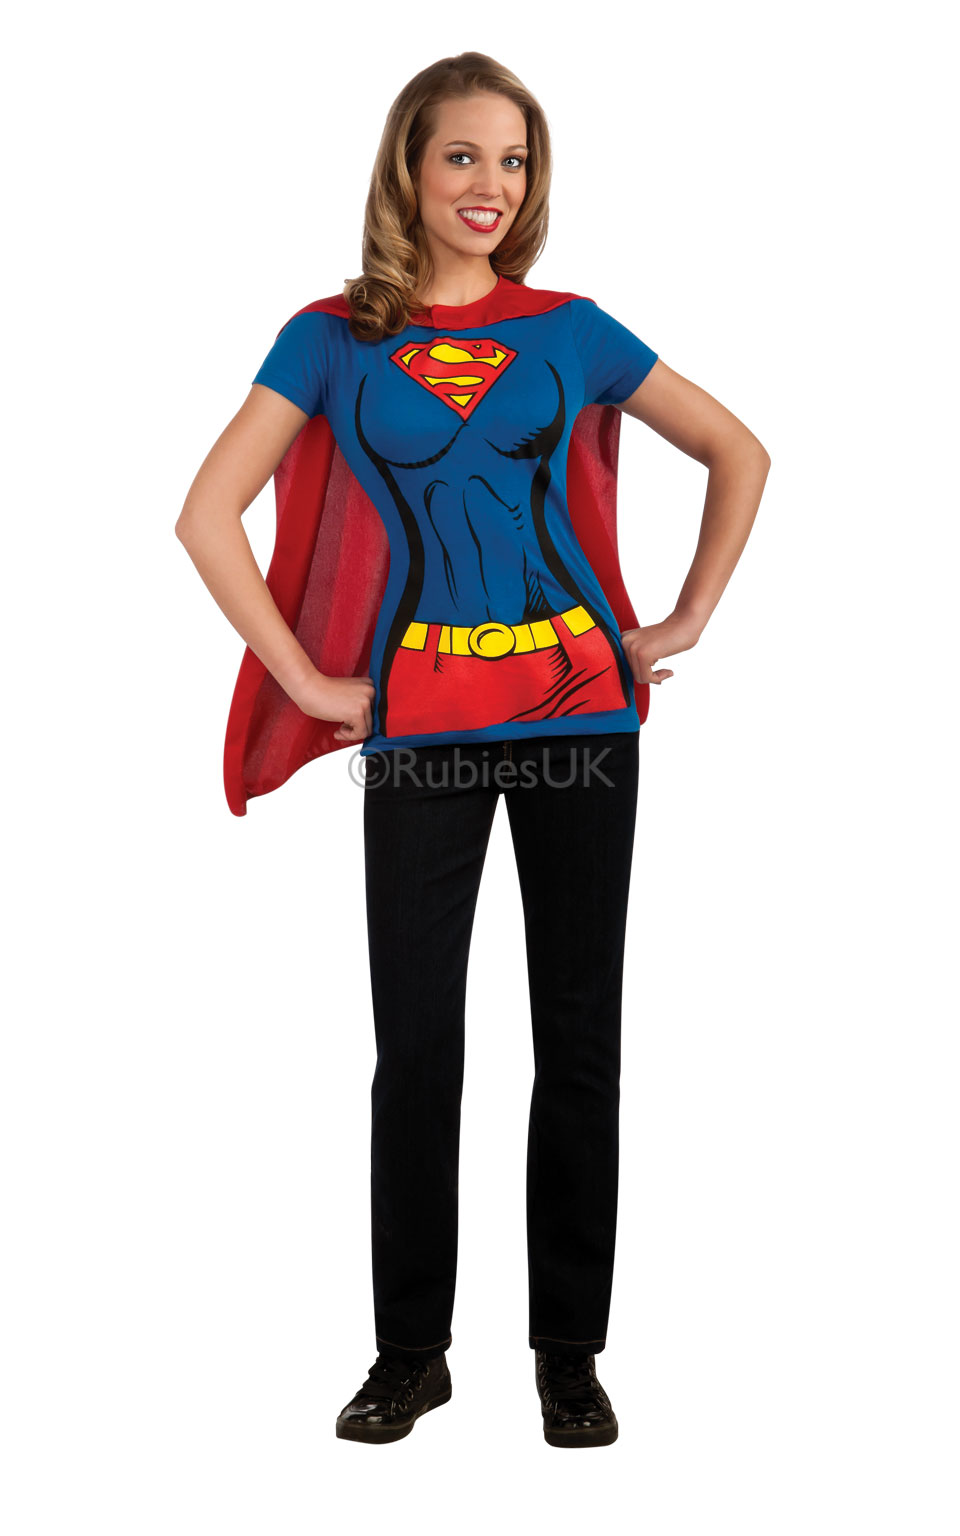 Kjøp Supergirl T skjorte Online Nå kun 439 Temashop.no